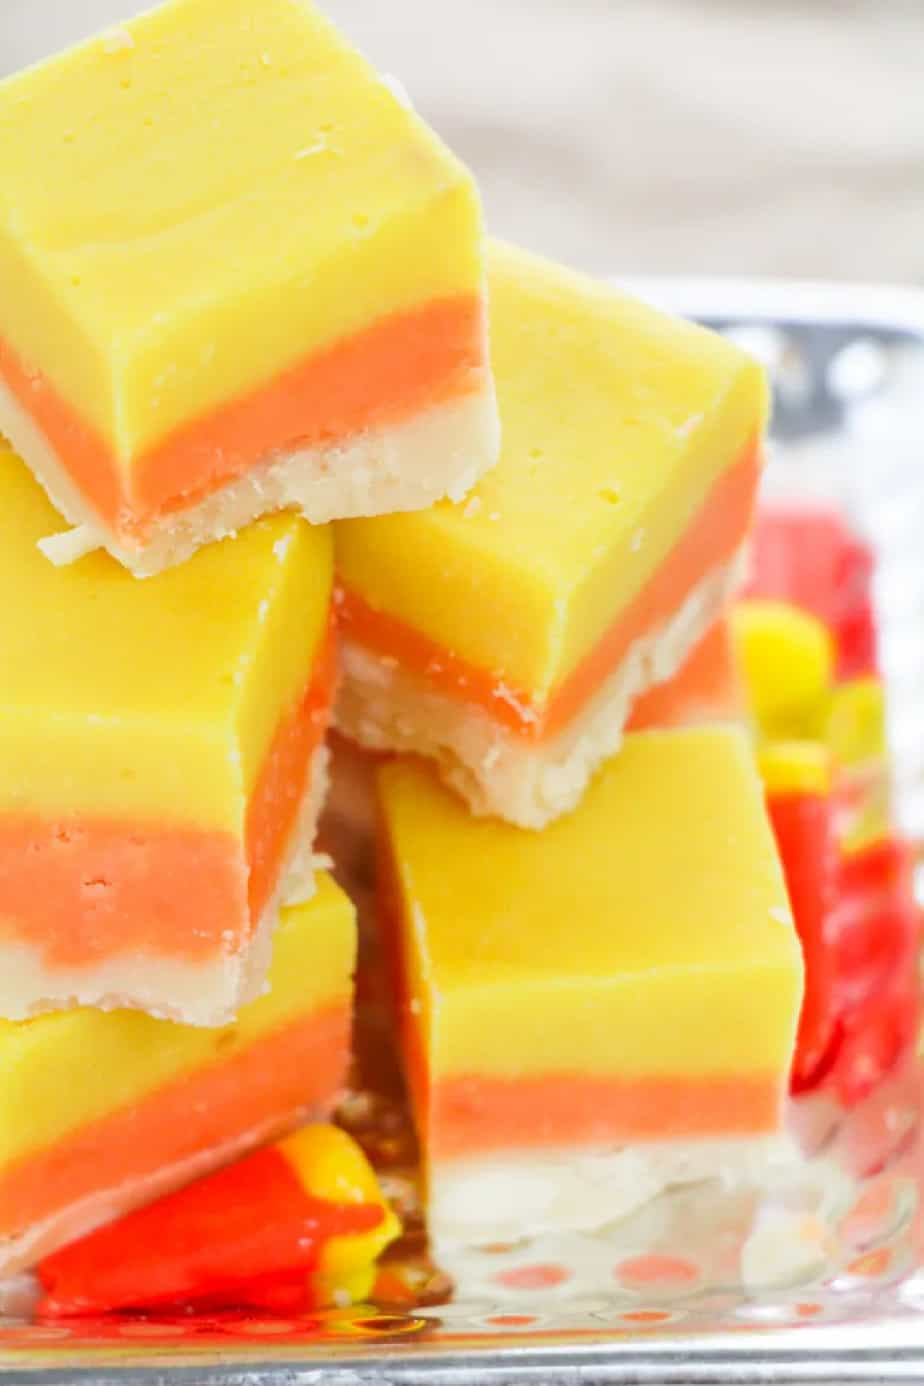 Layered yellow orange and white fudge to look like candy corn